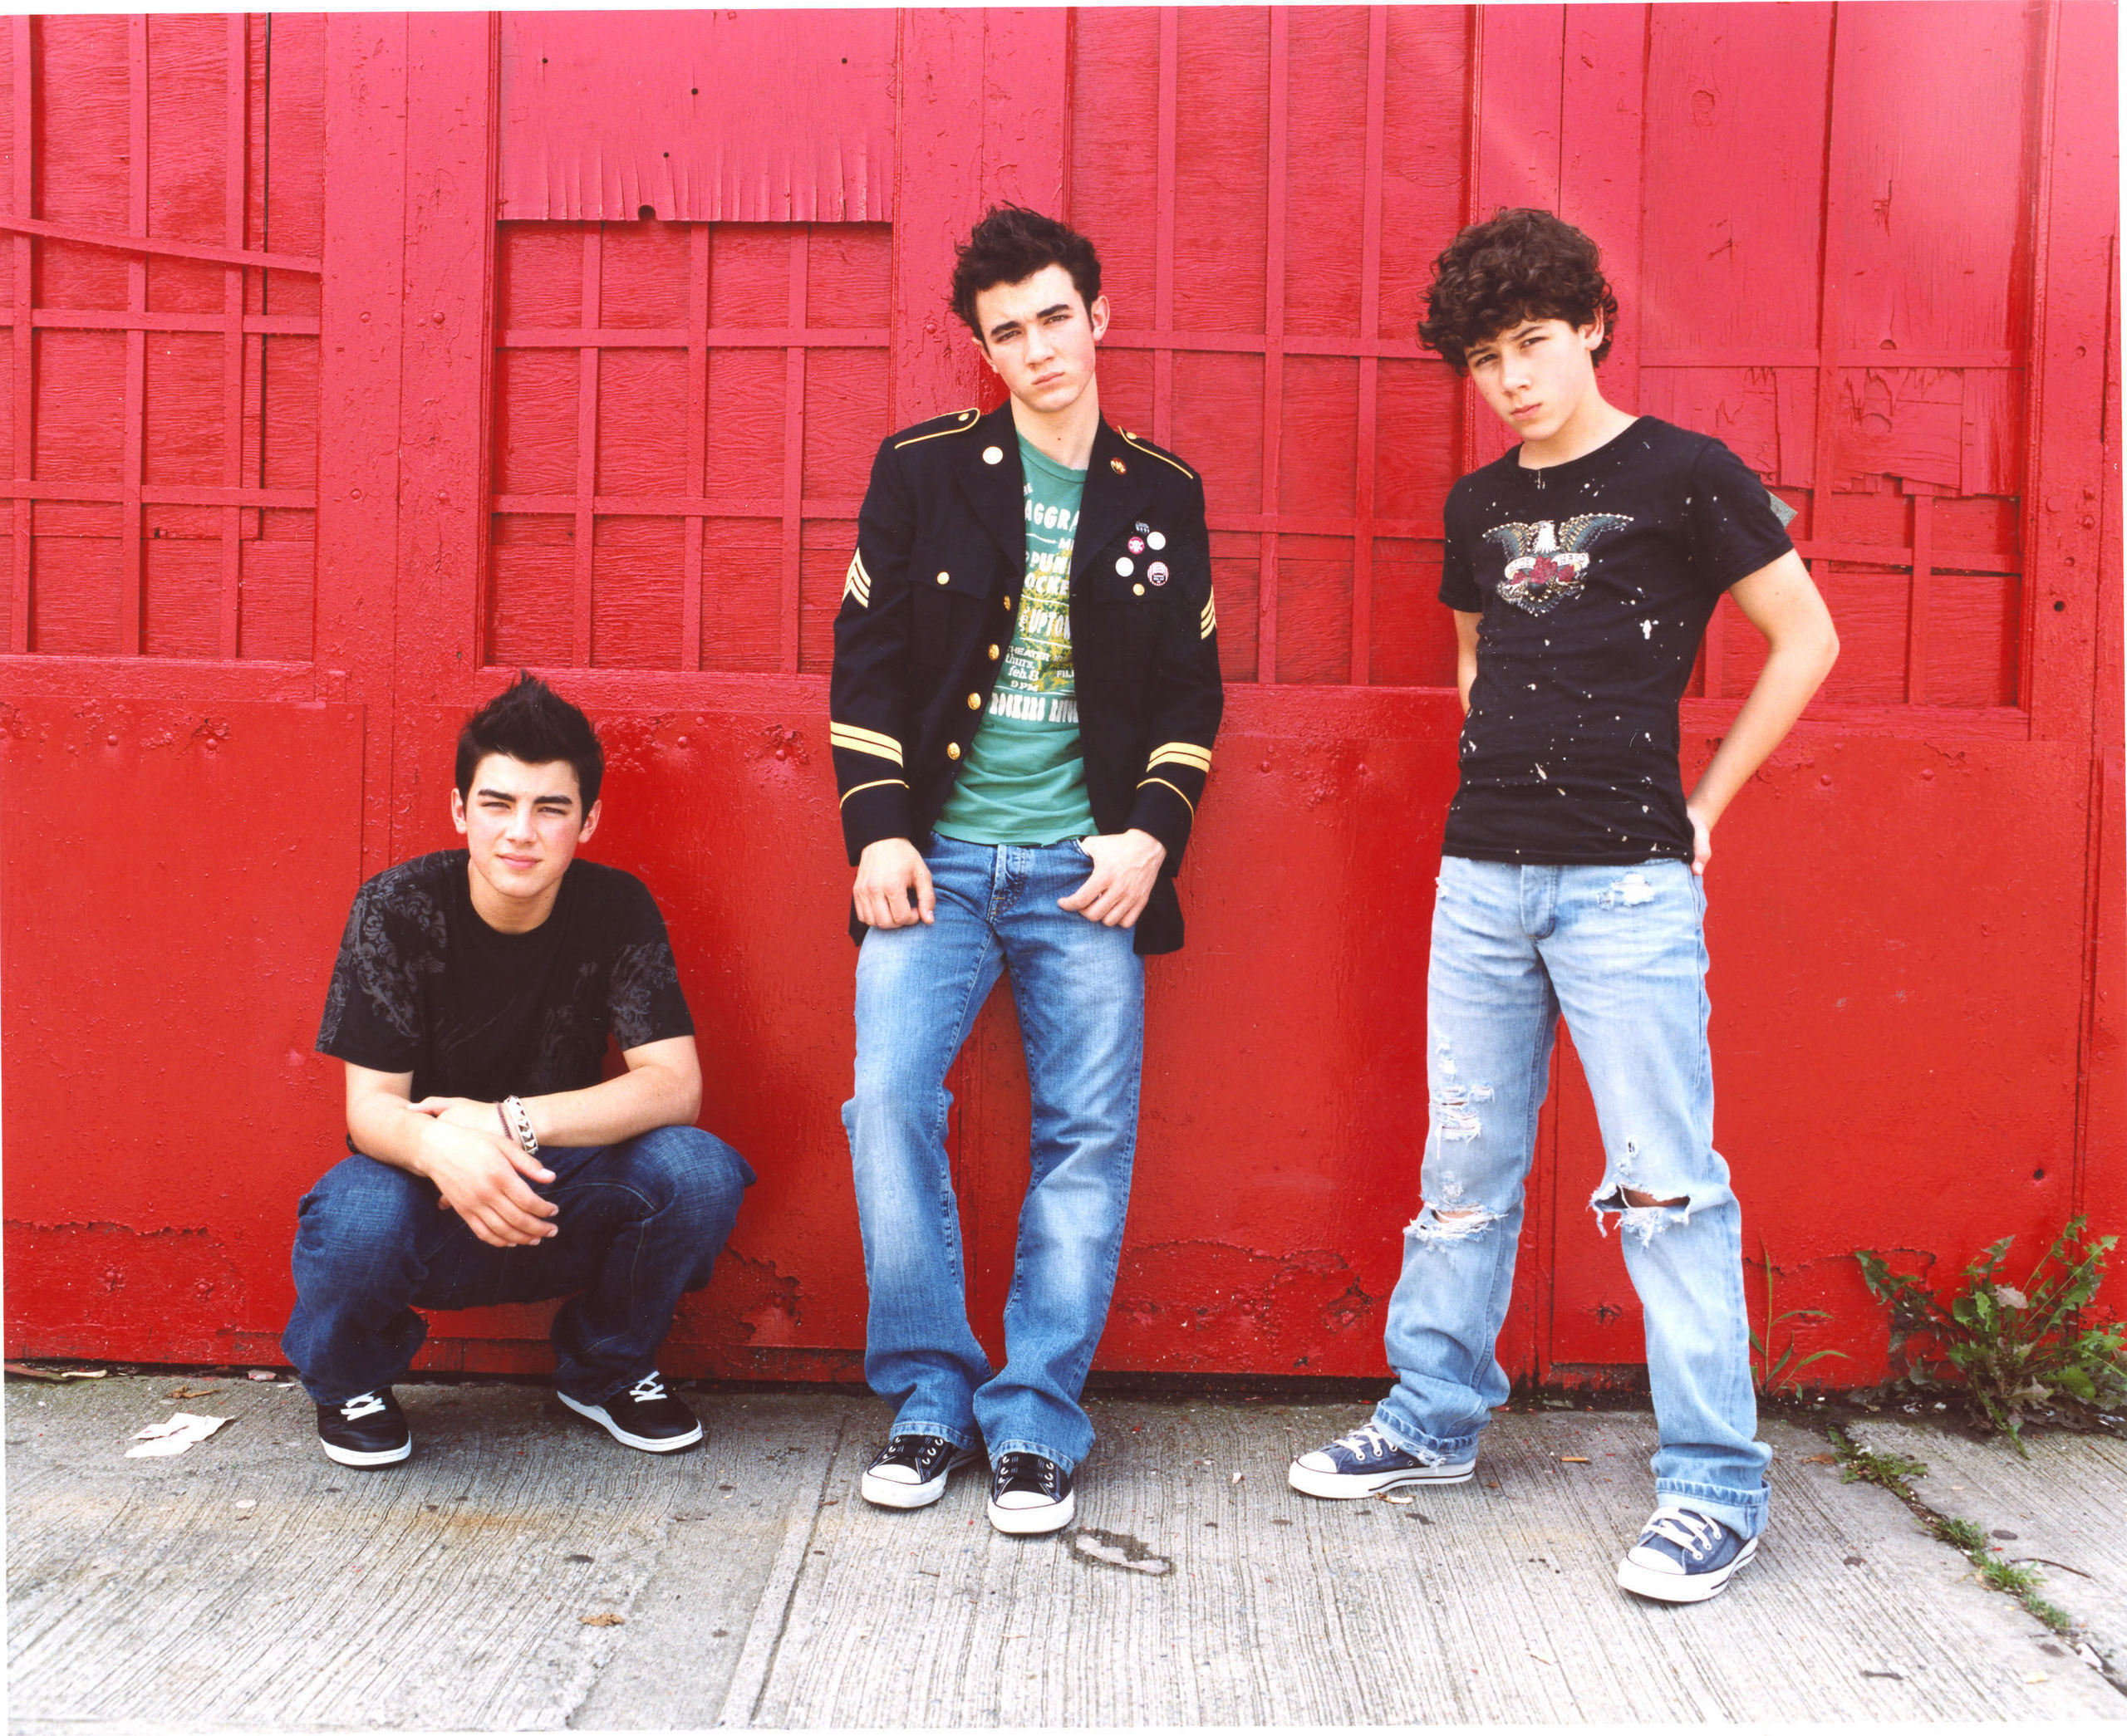 Jonas Brothers Wallpaper The Jonas Brothers Jb Photo